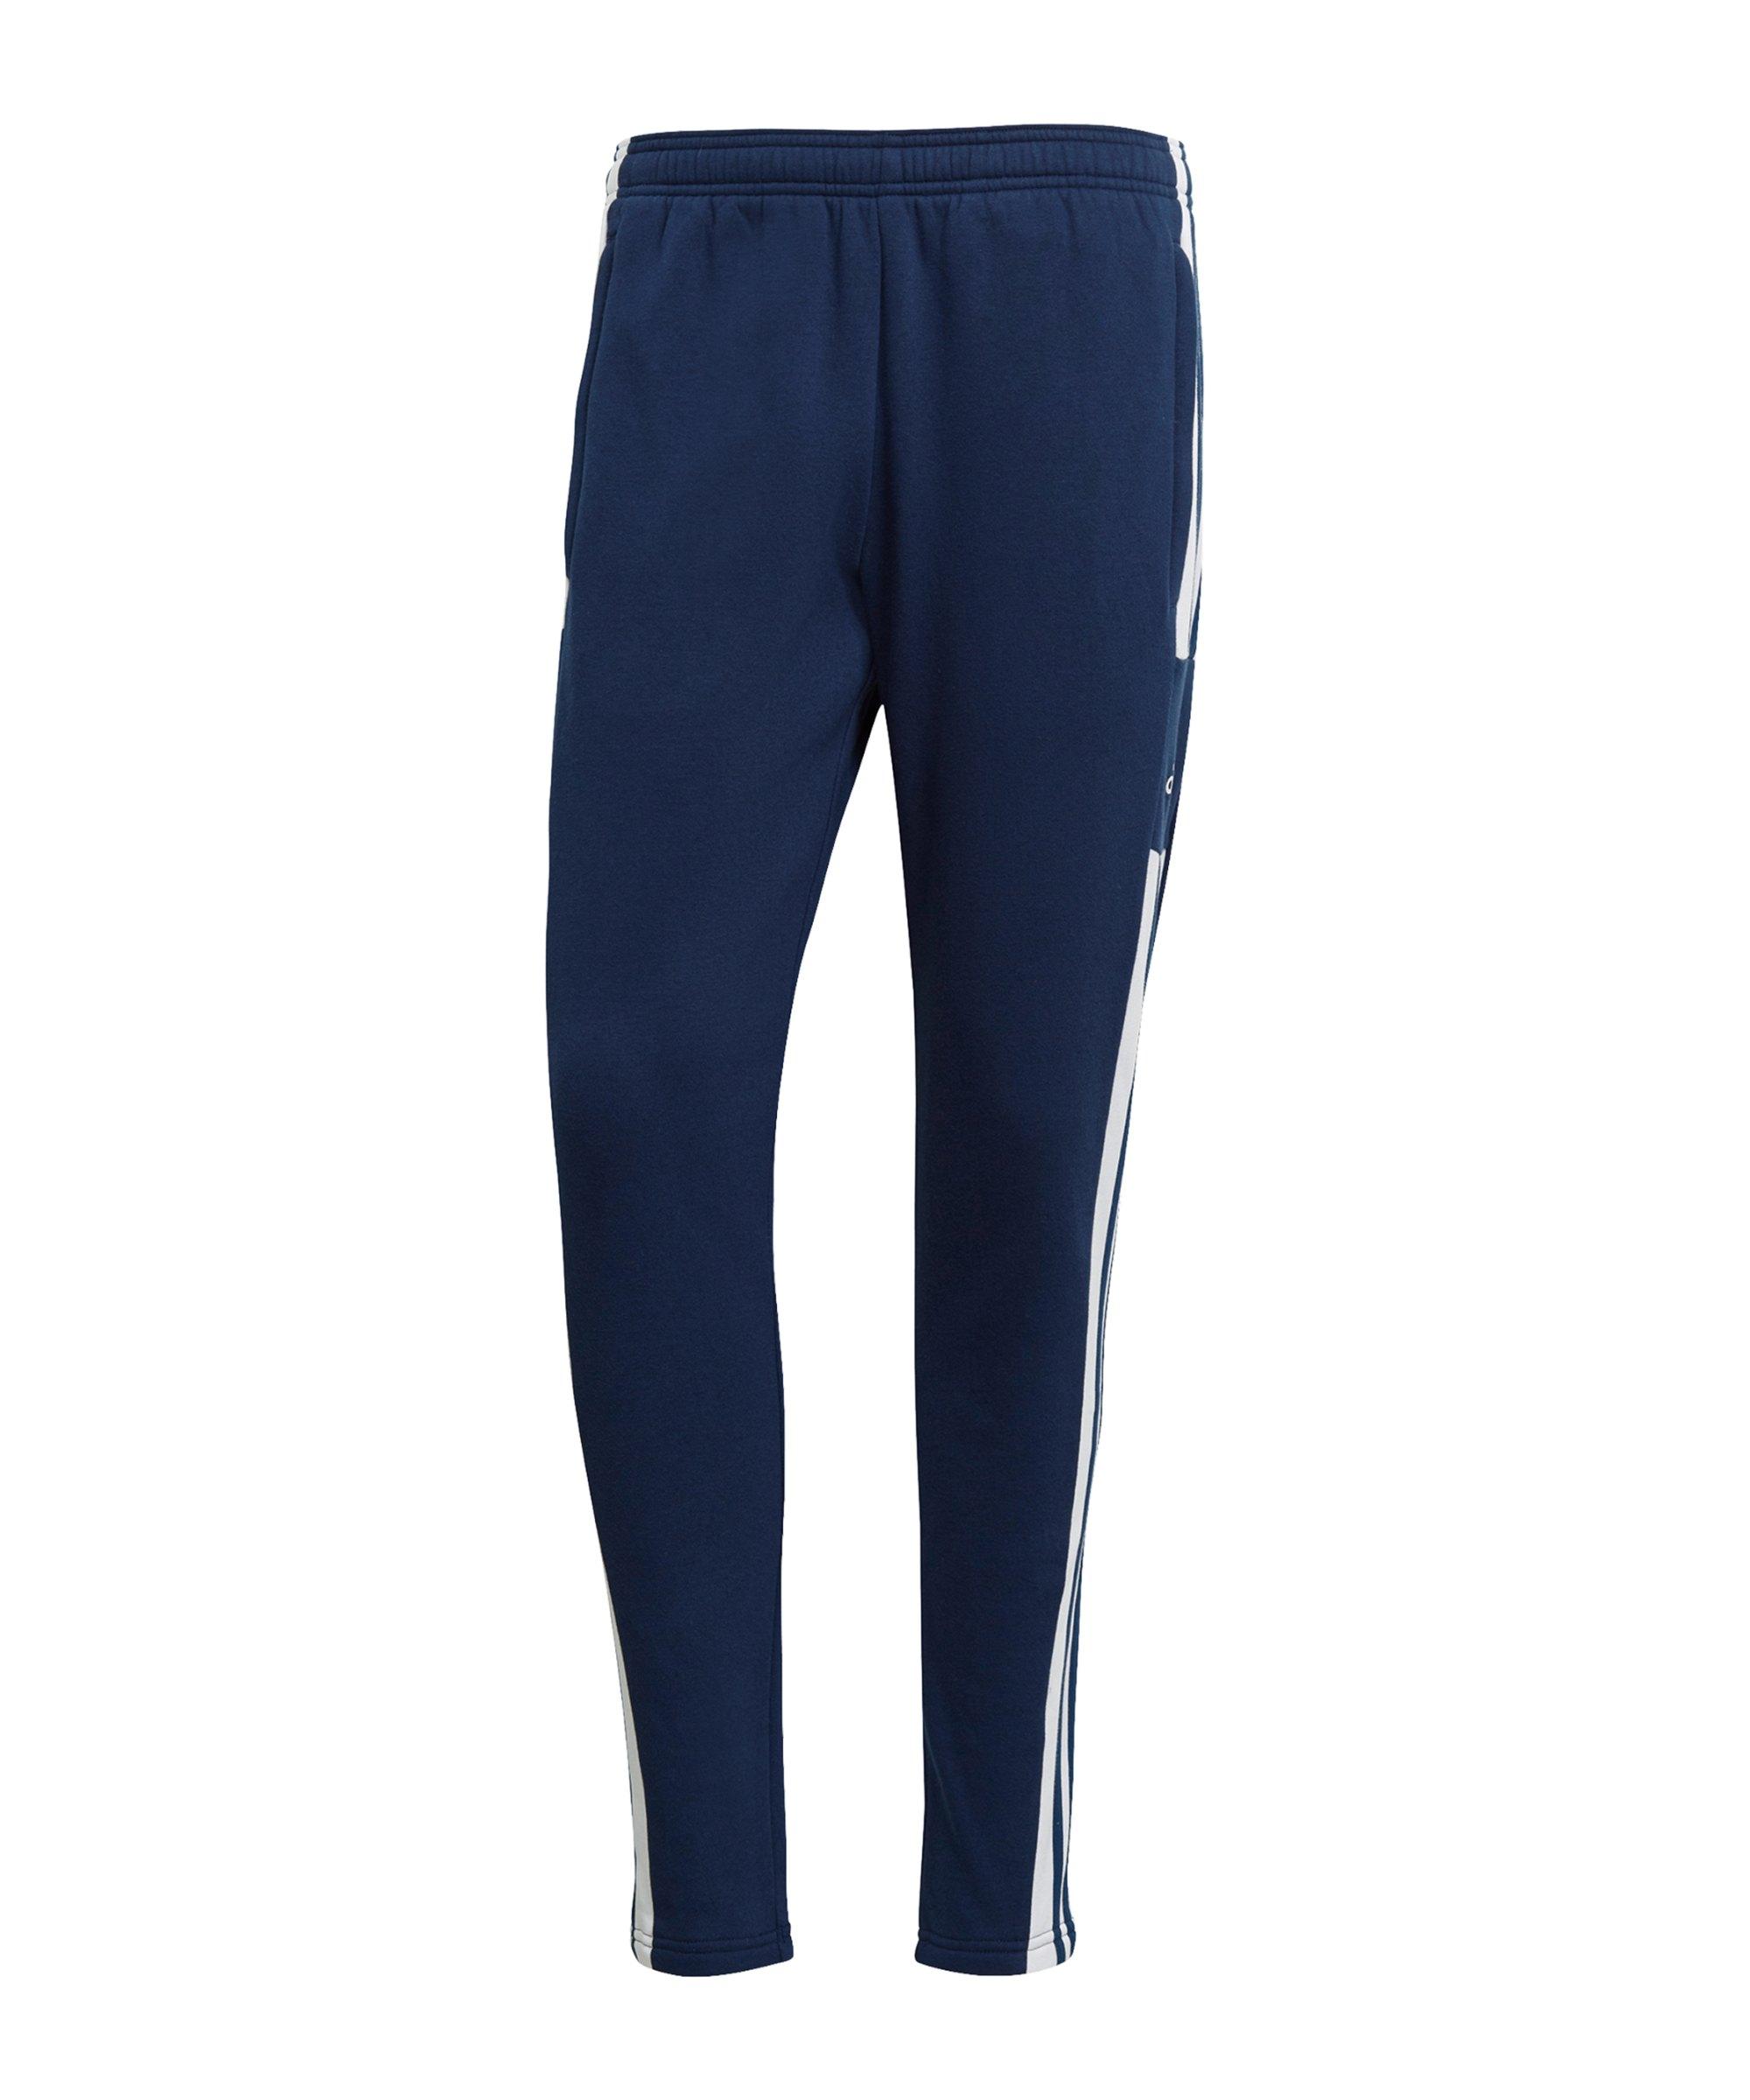 adidas Squadra 21 Sweat Jogginghose Blau - blau